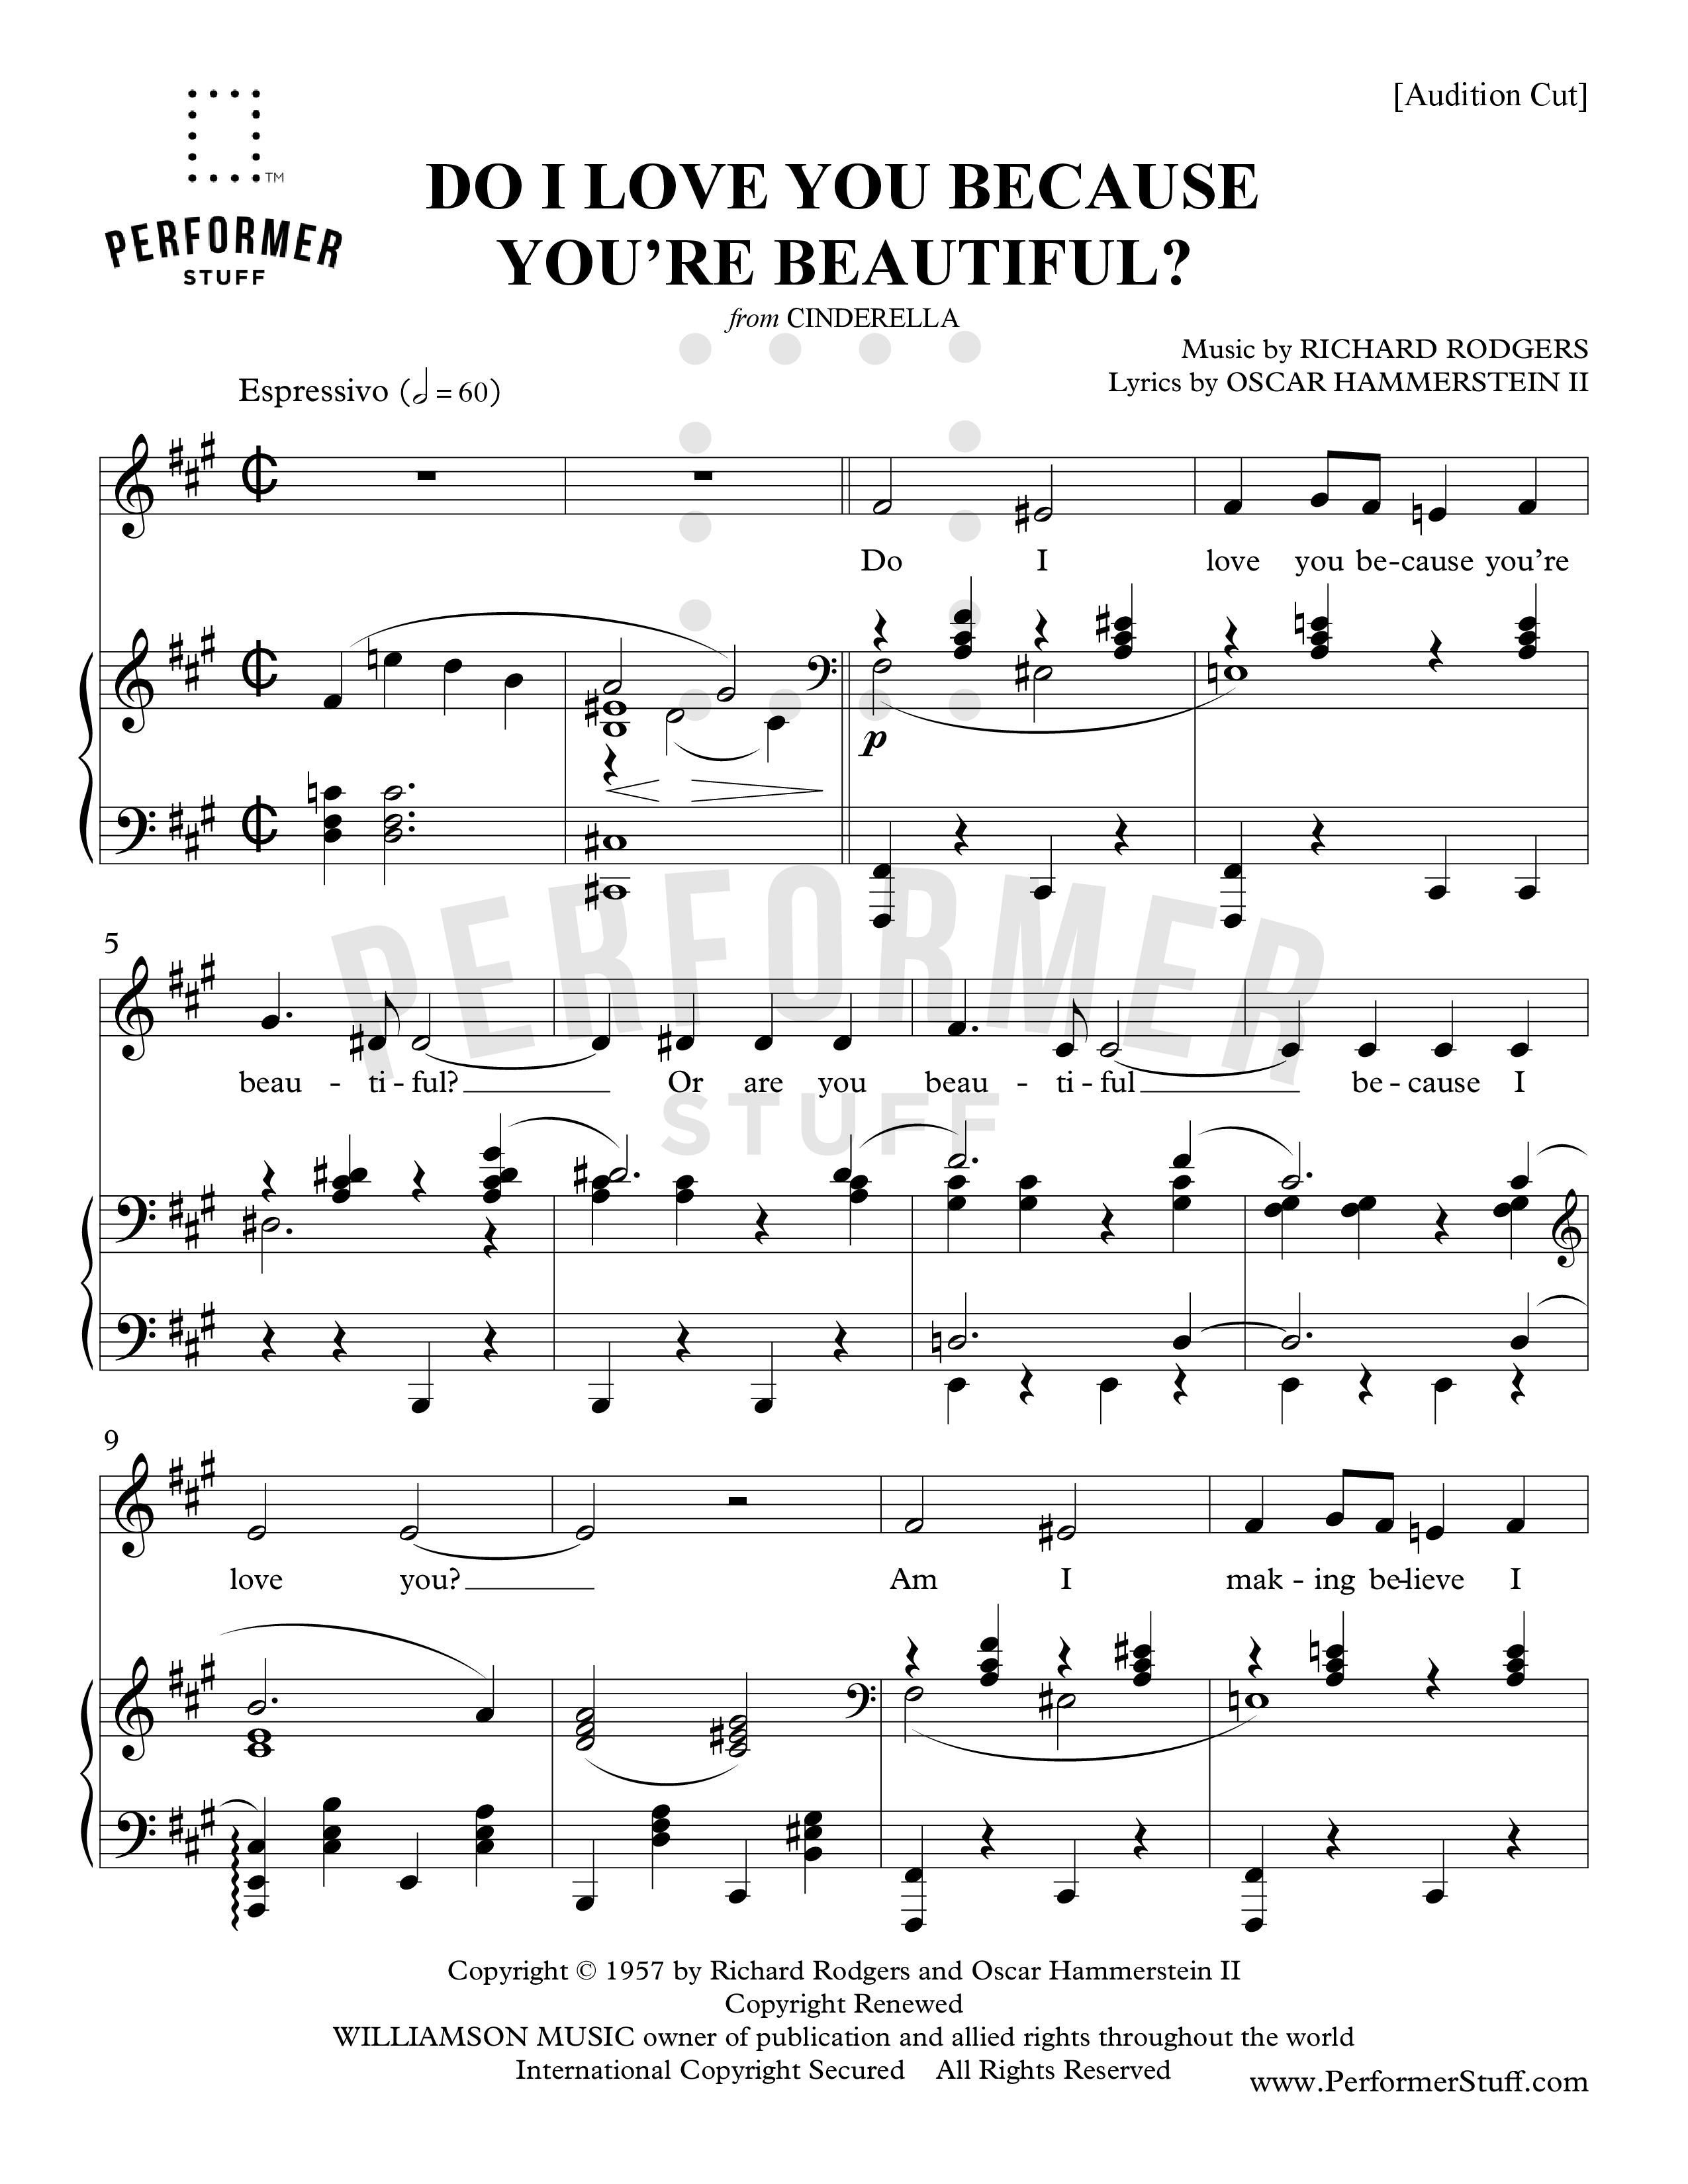 Do I Love You Because You're Beautiful?